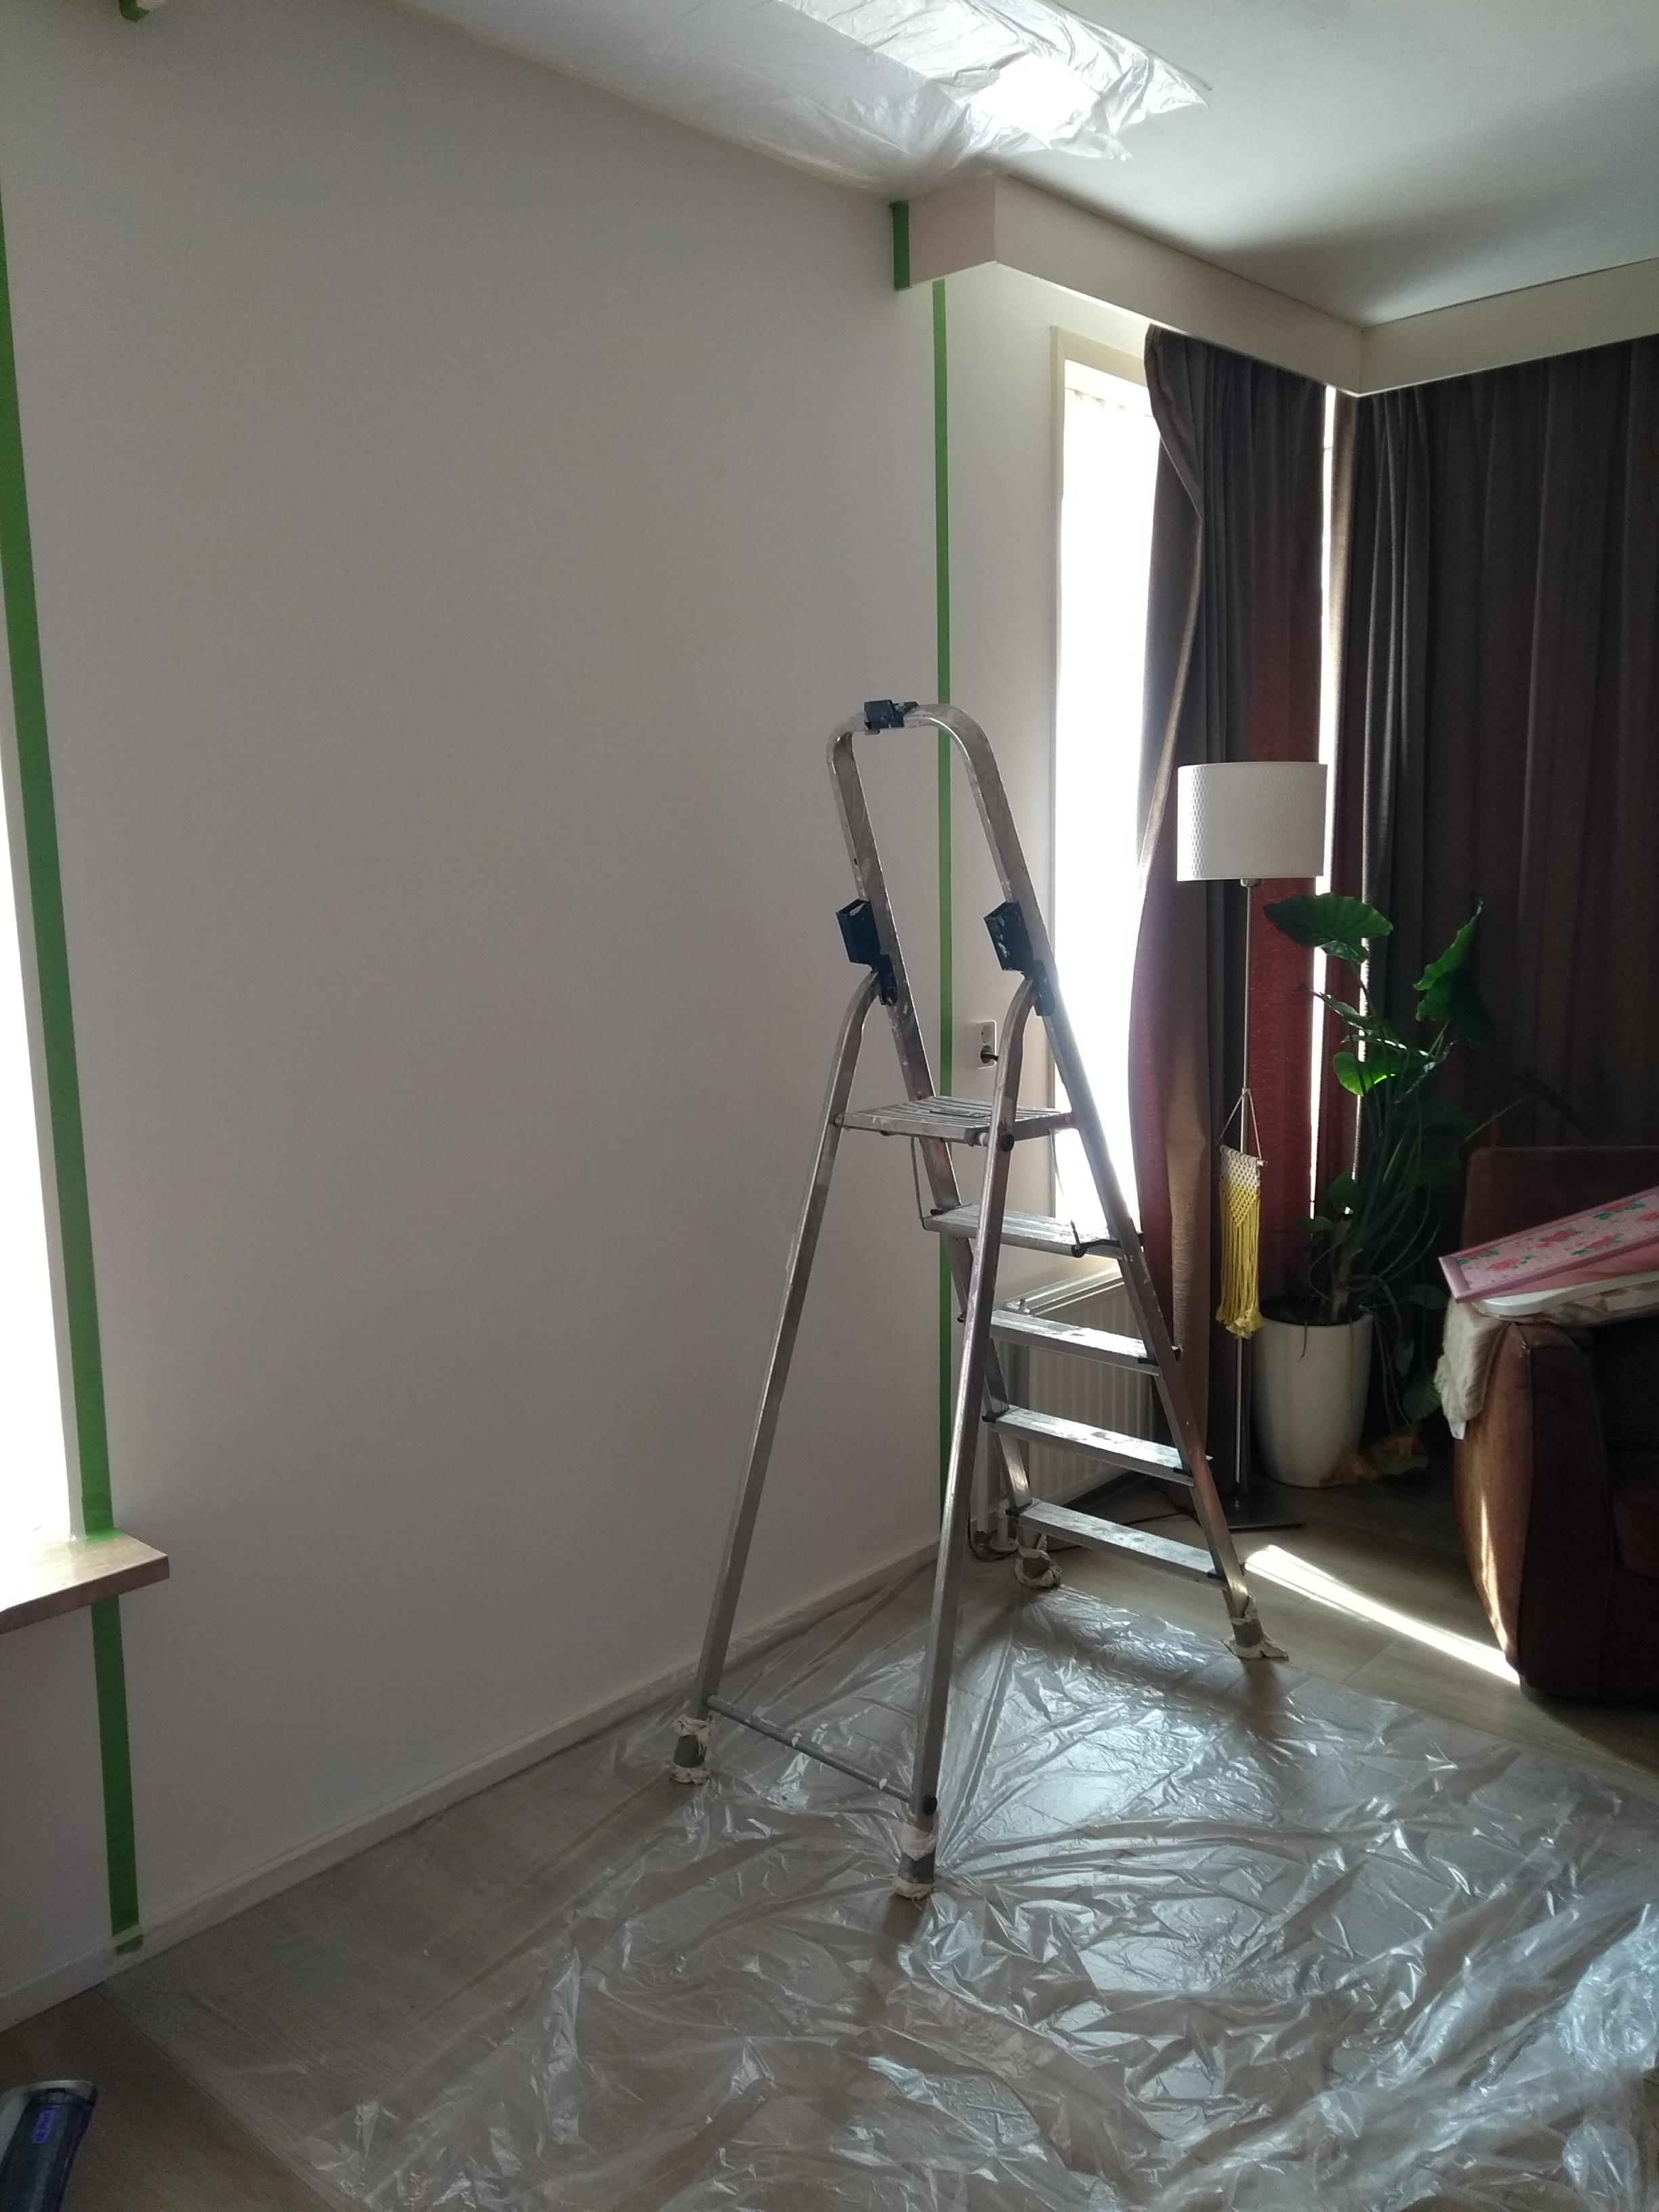 interieur, verven, muur verven, kleur, olijfgroen, groen, mamablog, lifestyle, wonen, woonkamer, thuis, lalog.nl, blog